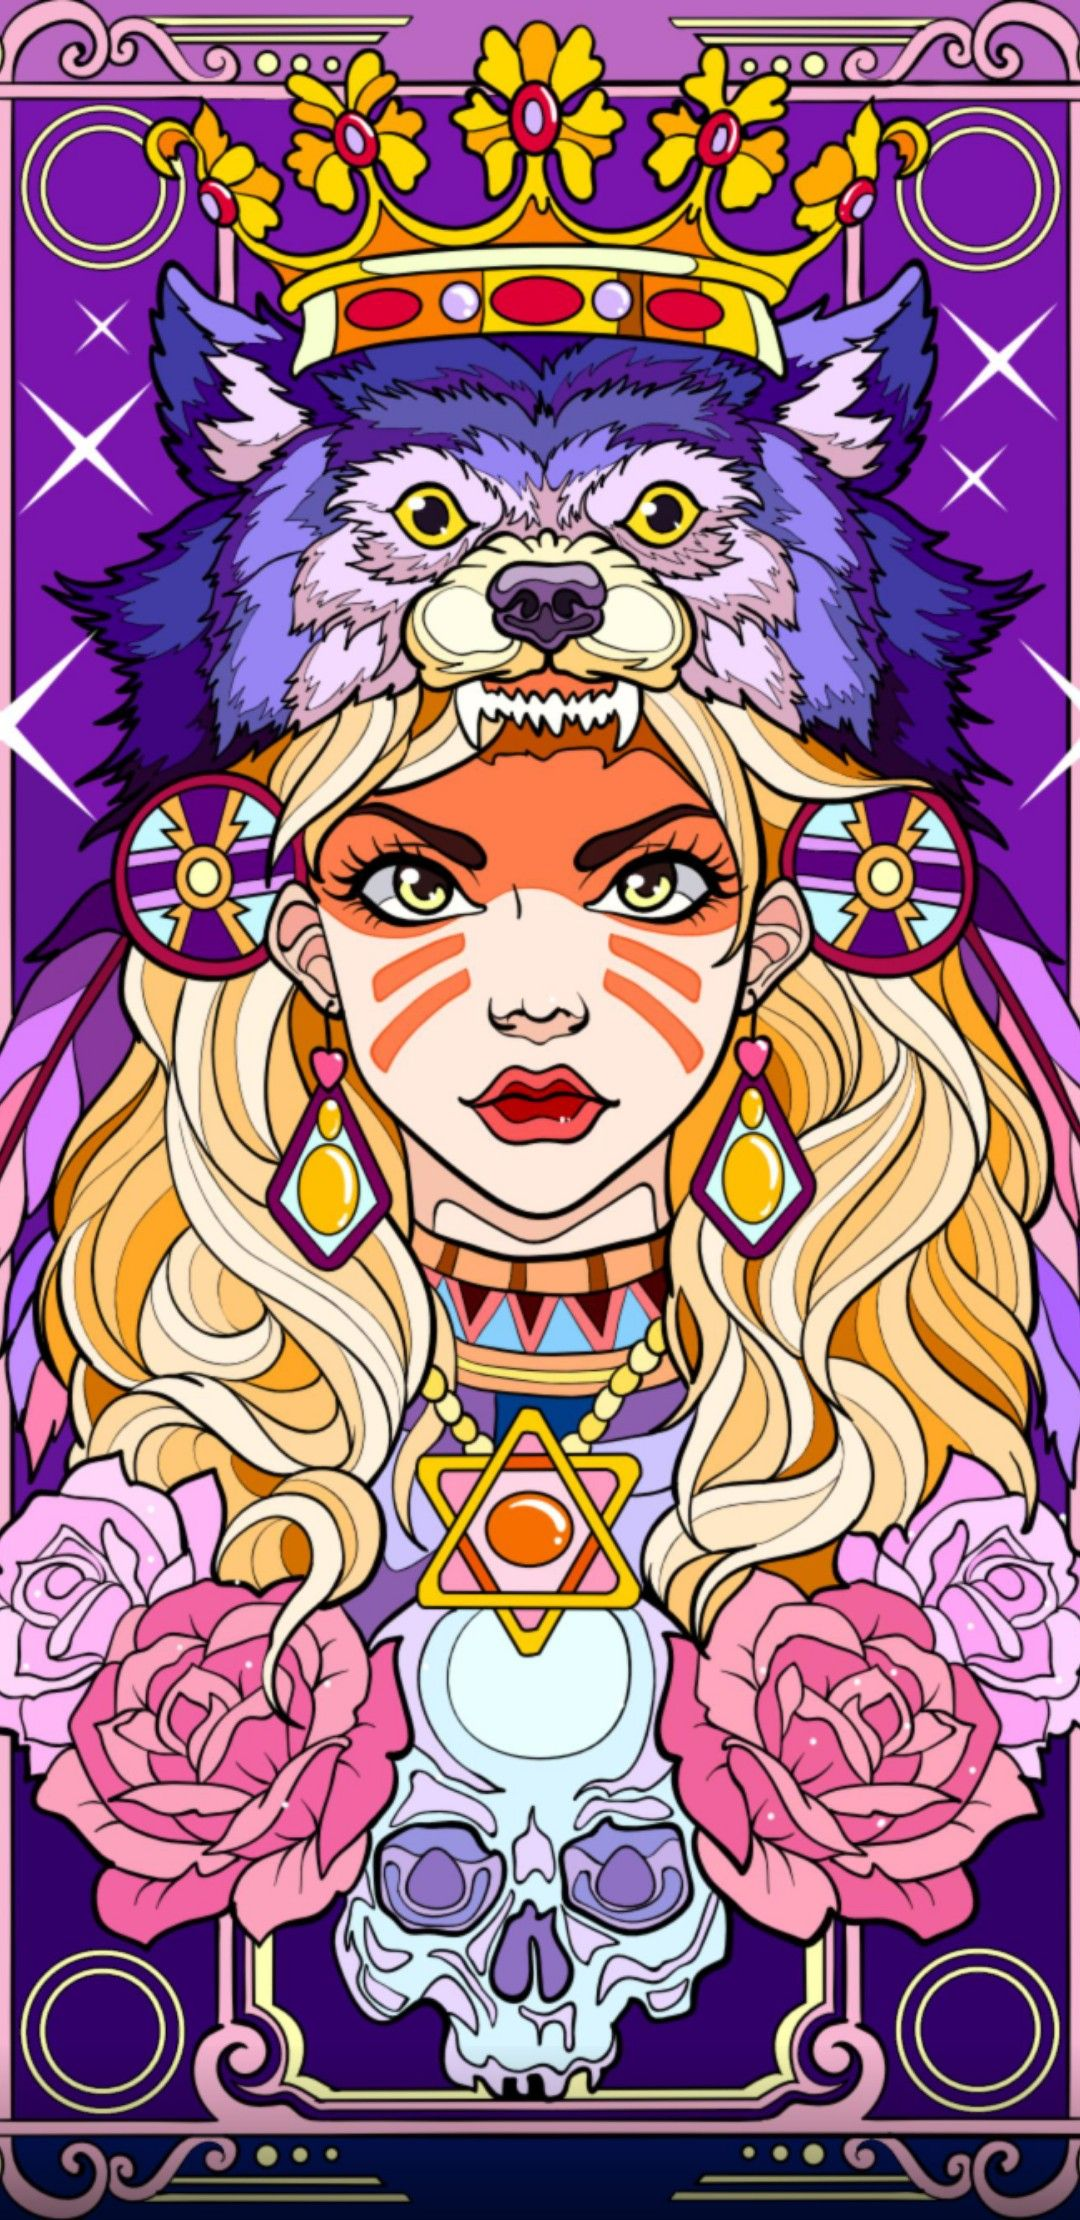 Pin By Yessica Marina On Colouring Sheets Art Cute Drawings Visual Art